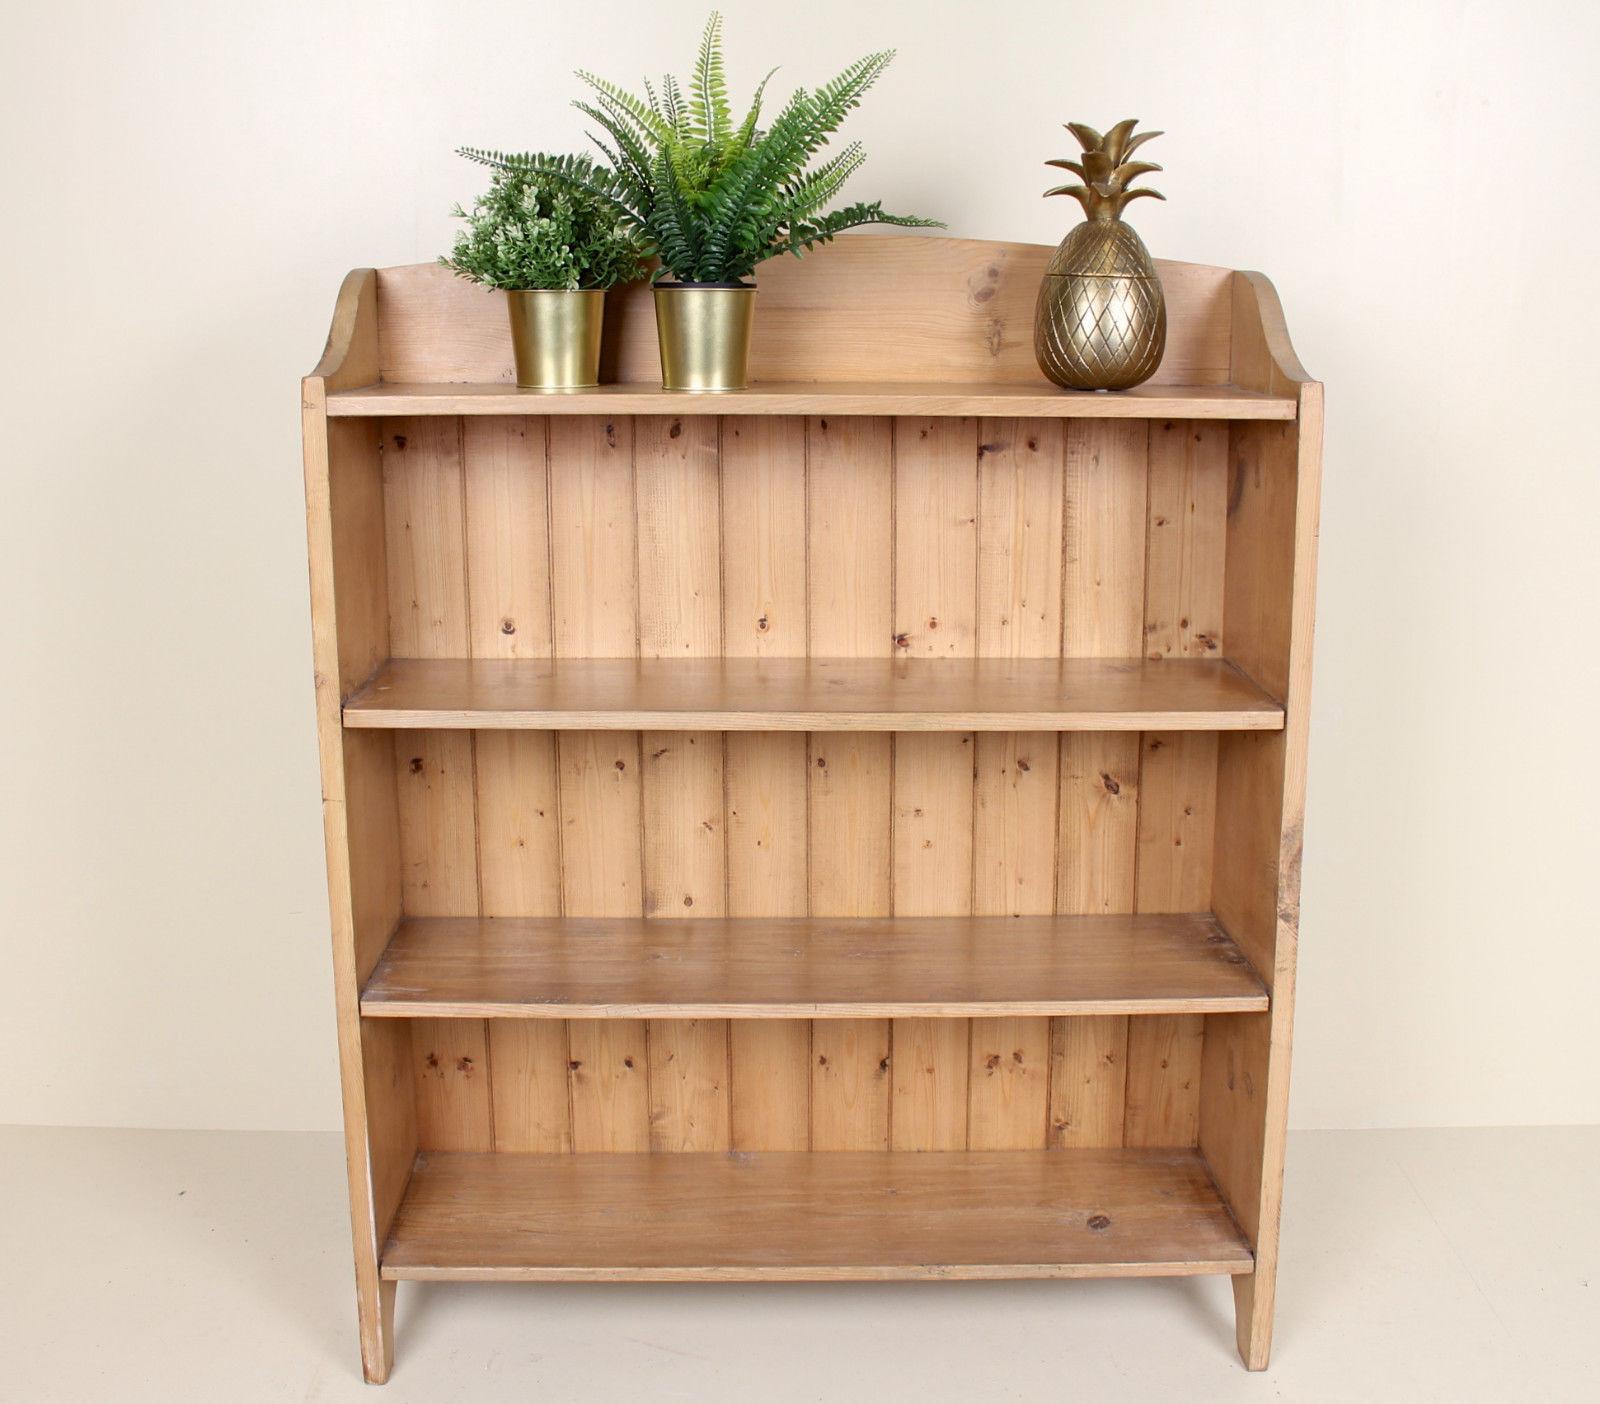 Antique Vintage Bookcase Arts Crafts Pine Open Bookshelves Cabinet Rustic